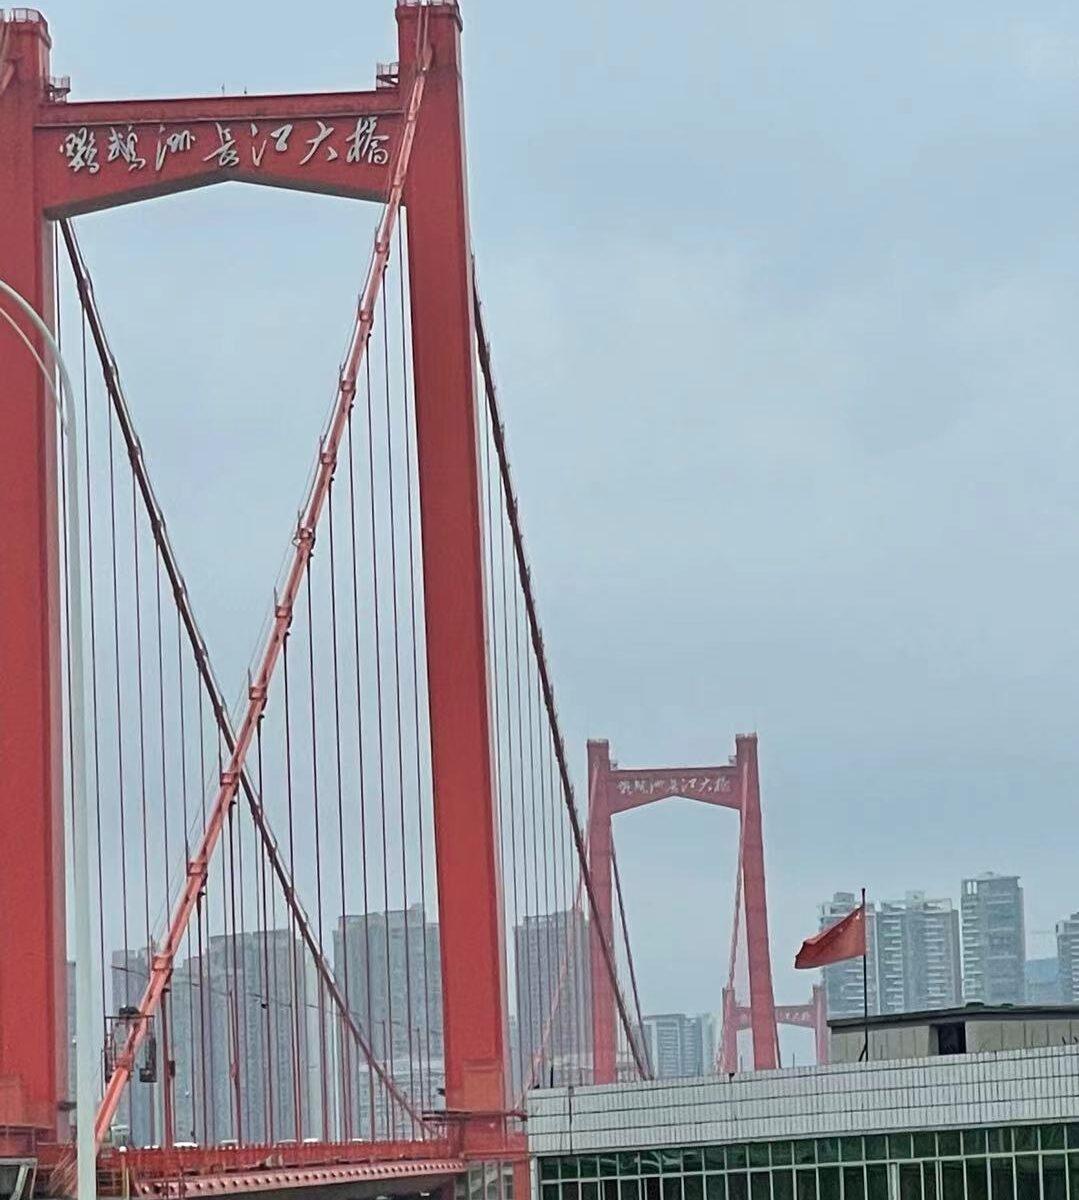 The Parrot Island Yangtze River bridge, Wuhan, Hubei, China